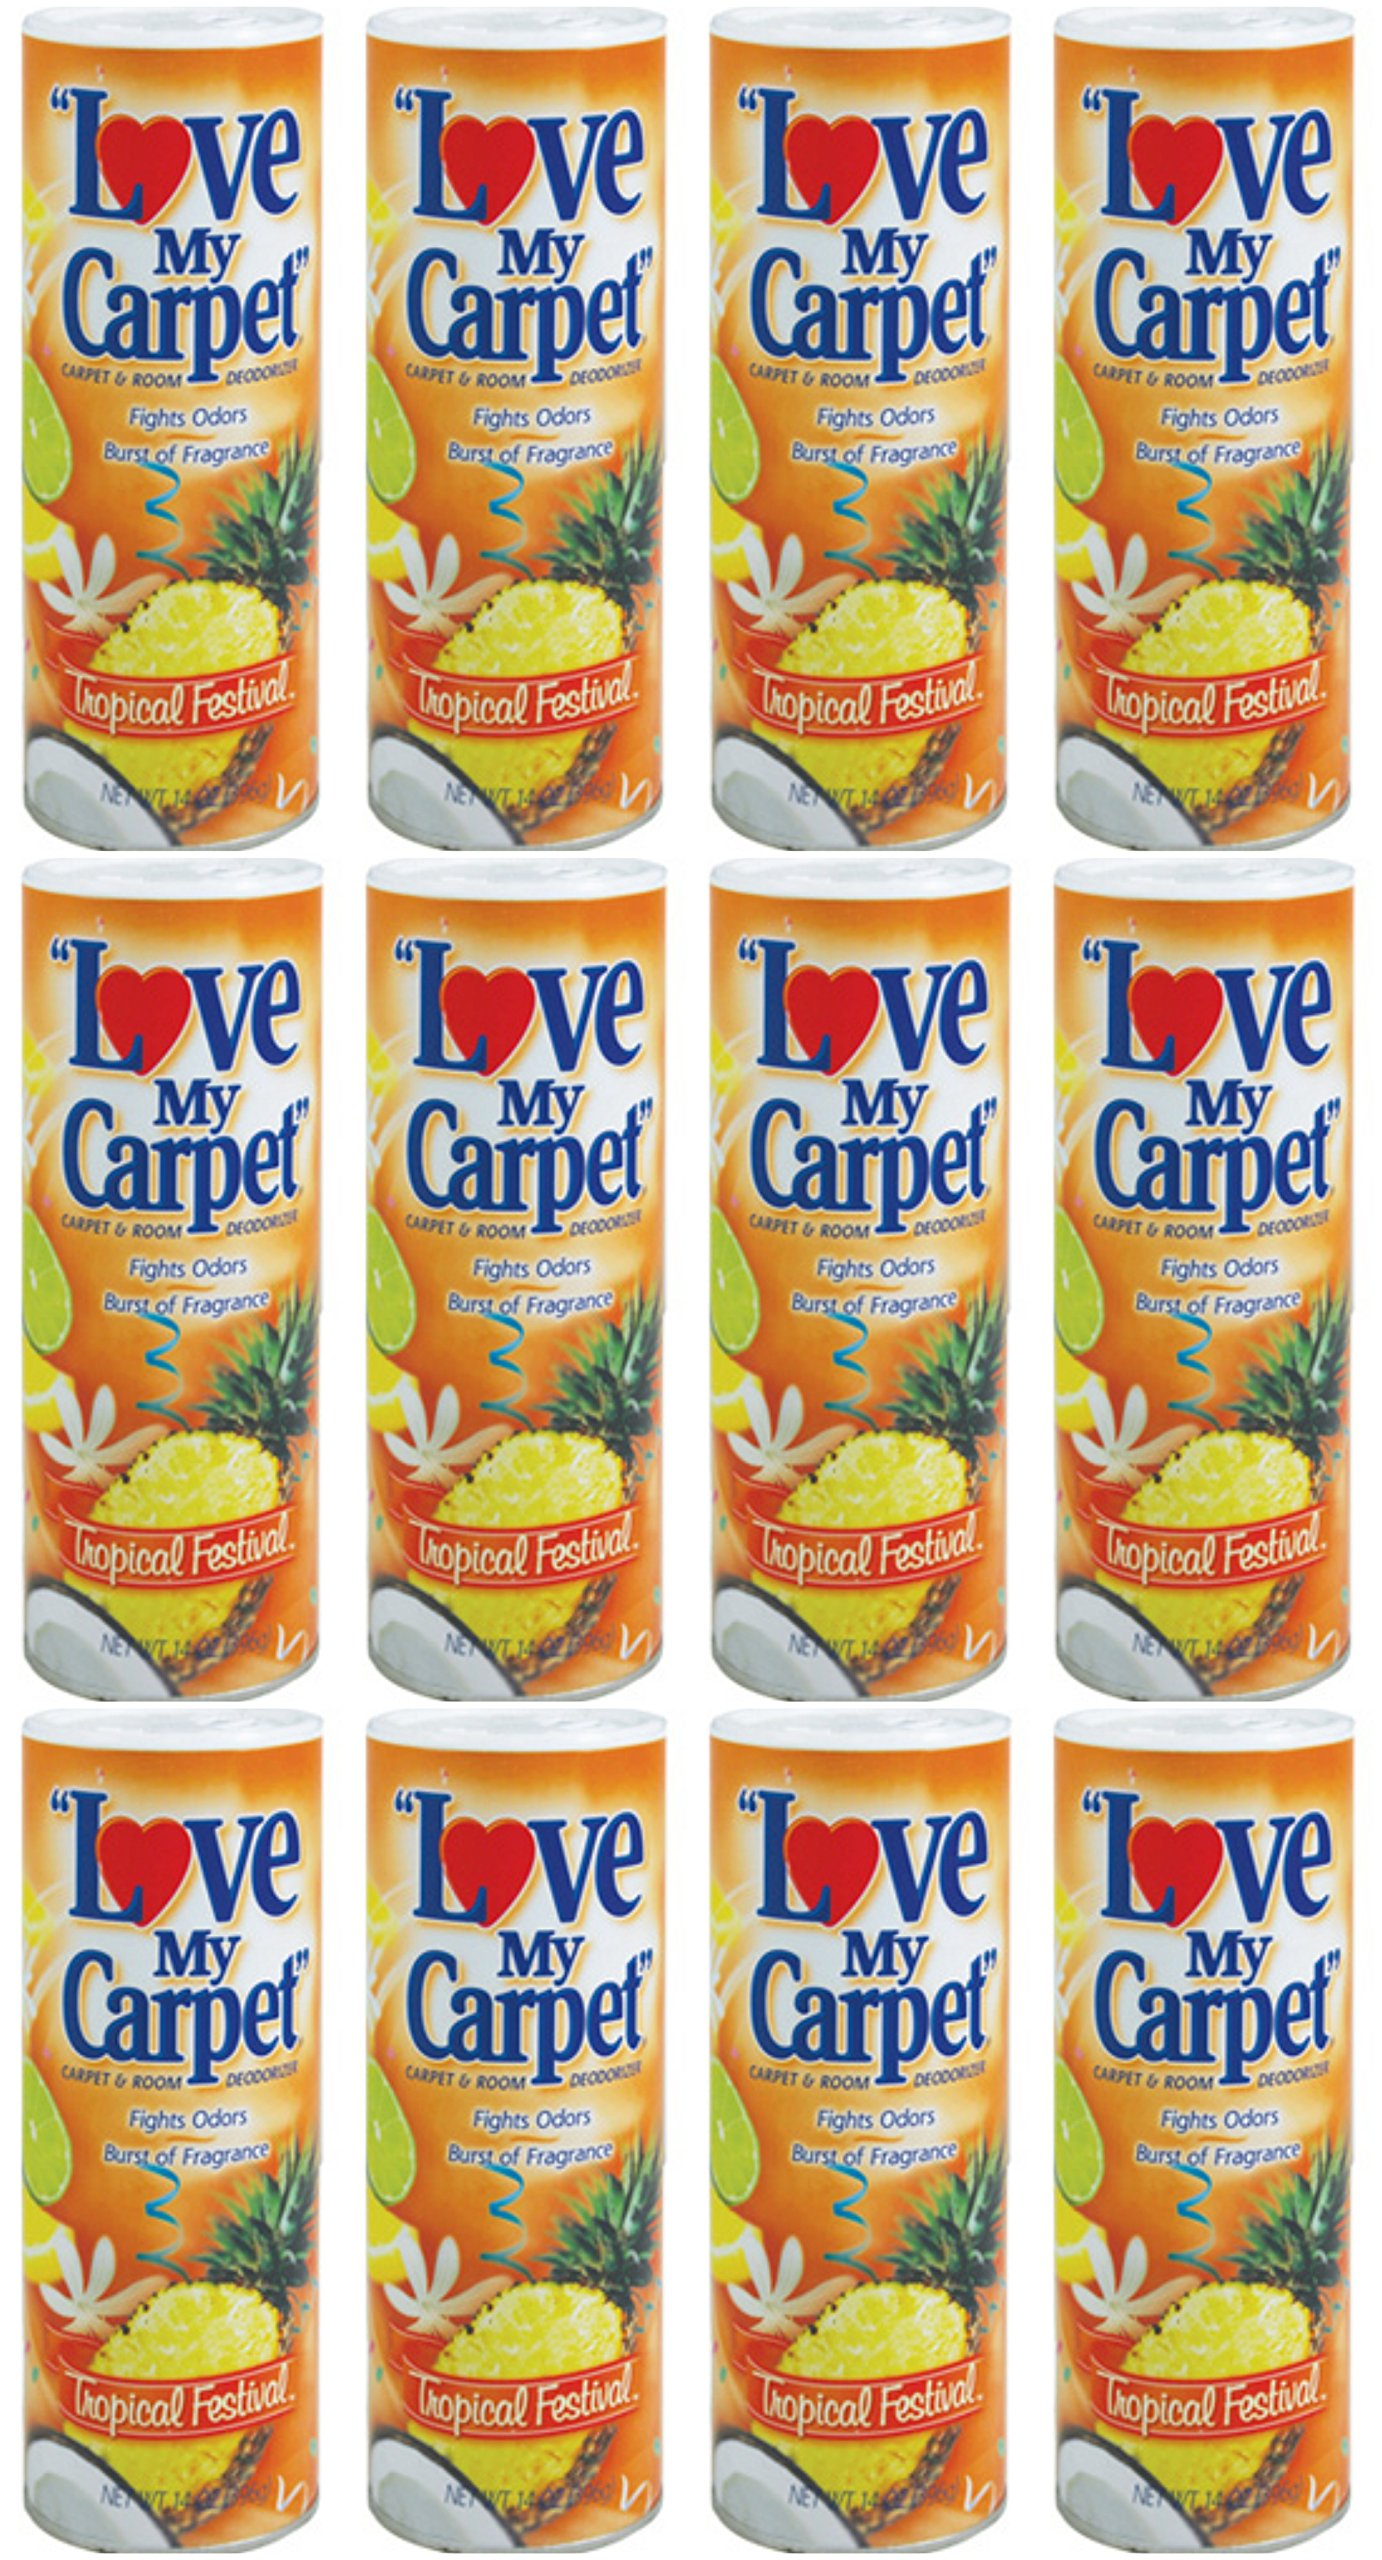 Lot of 12 (one dozen) I love my carpet Tropical Festival, 14oz/each